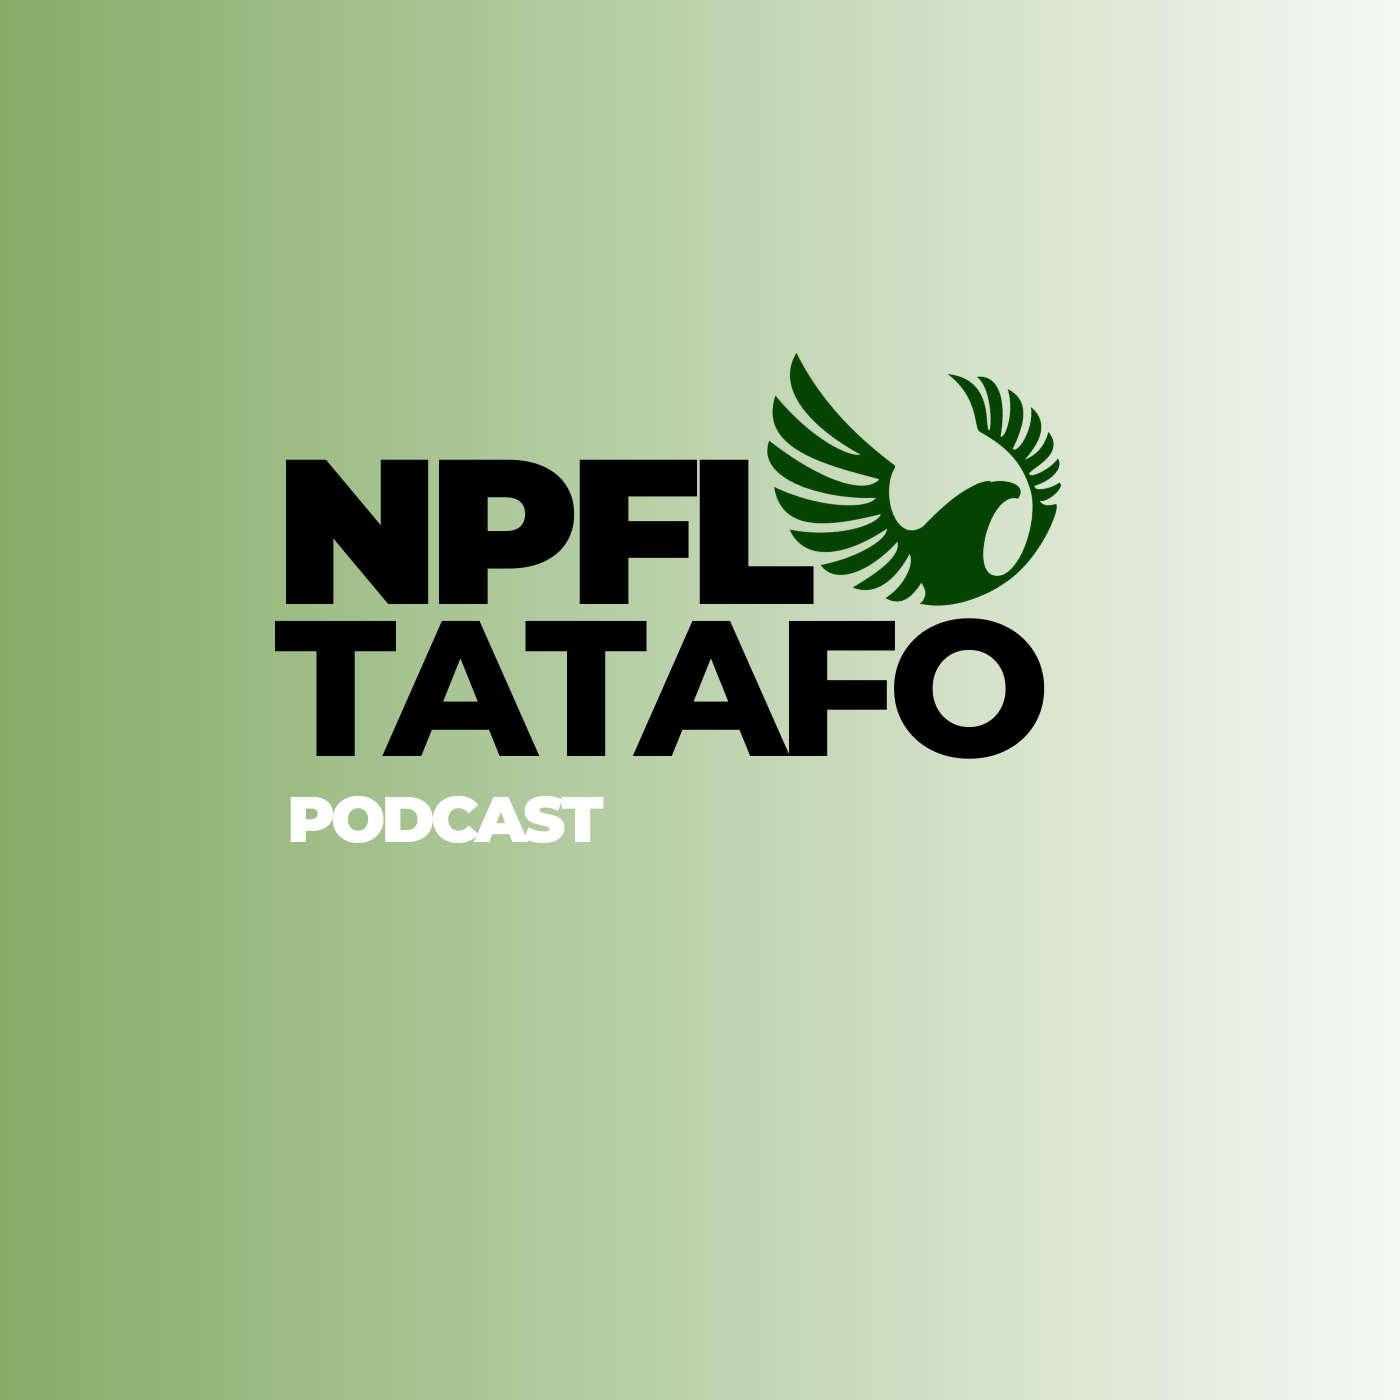 NPFL TATAFO PODCAST